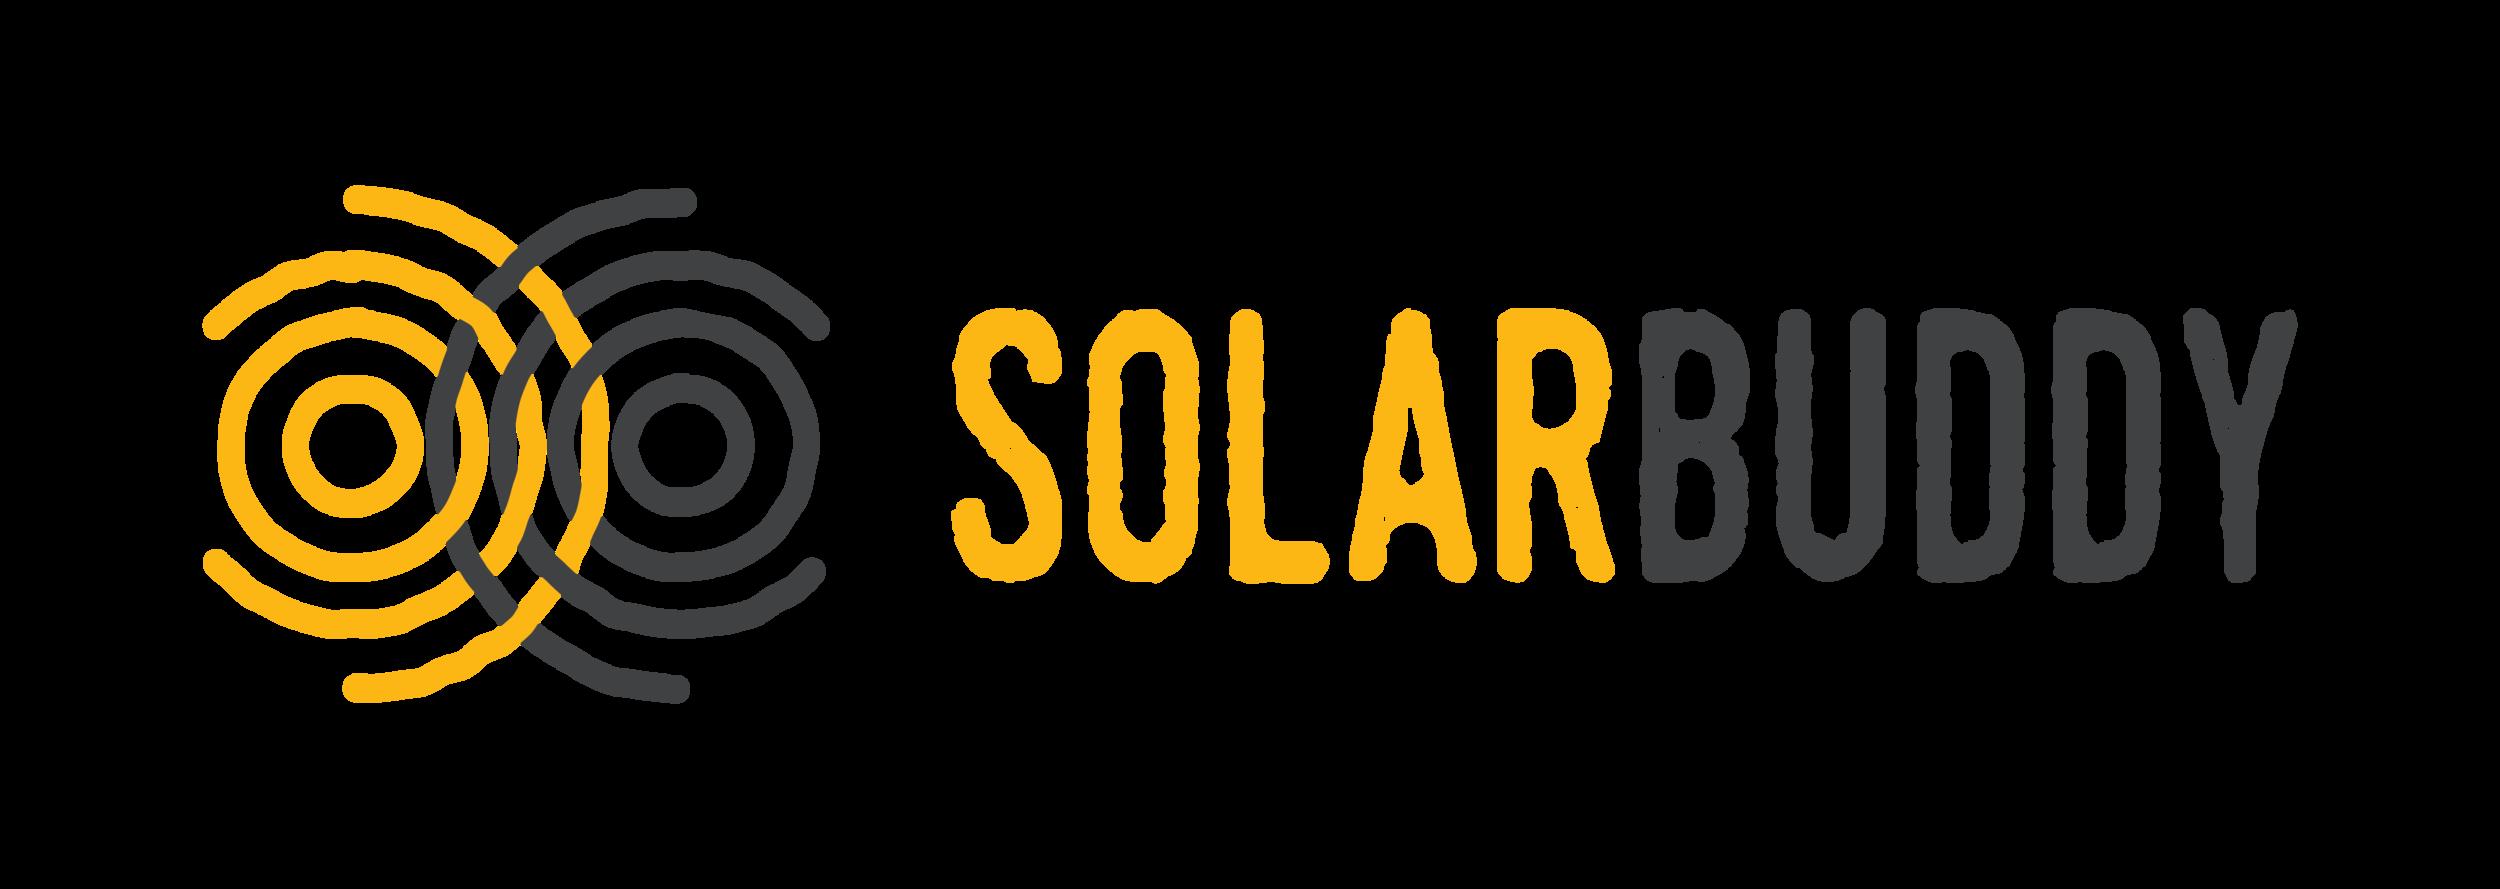 SolarBuddy-logo_light-horizontal.png